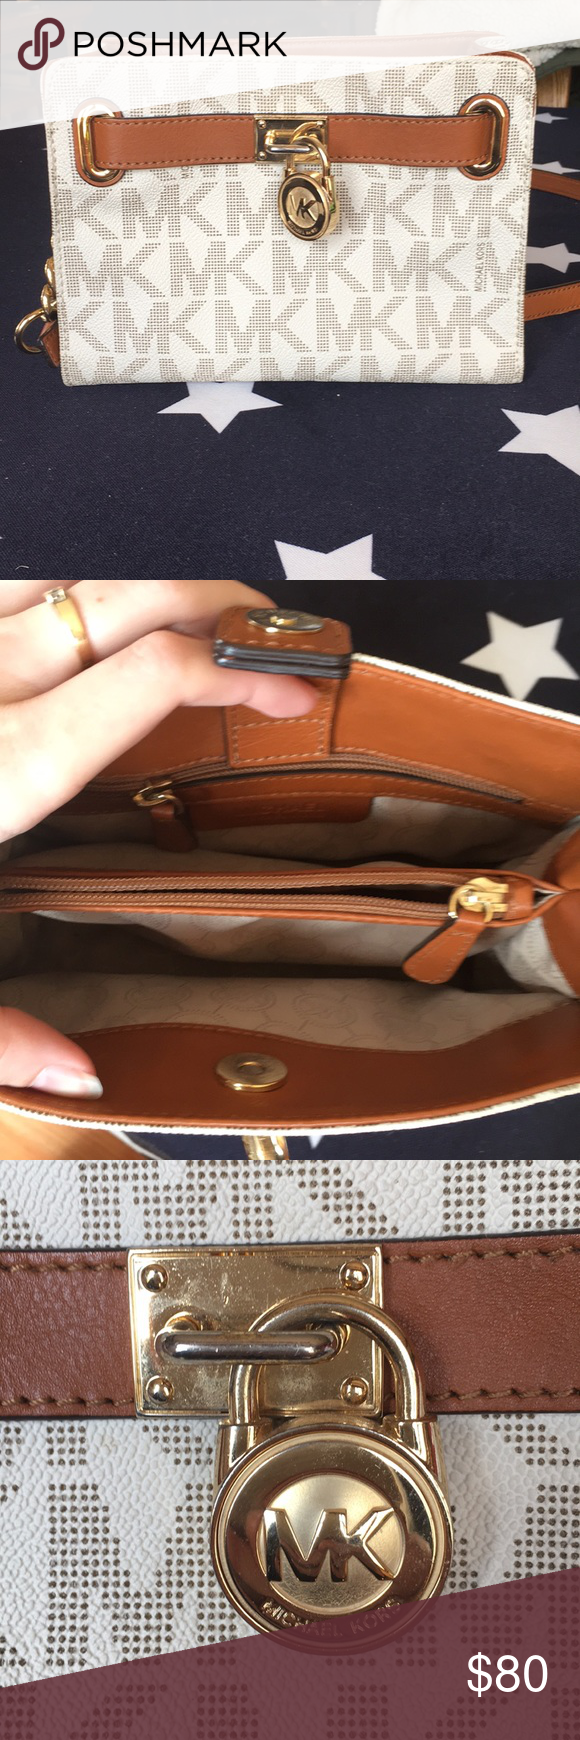 8be351873e36 Next to new Michael Kors Purse Monogram satchel 1974222 Michael Kors Bags  Shoulder Bags